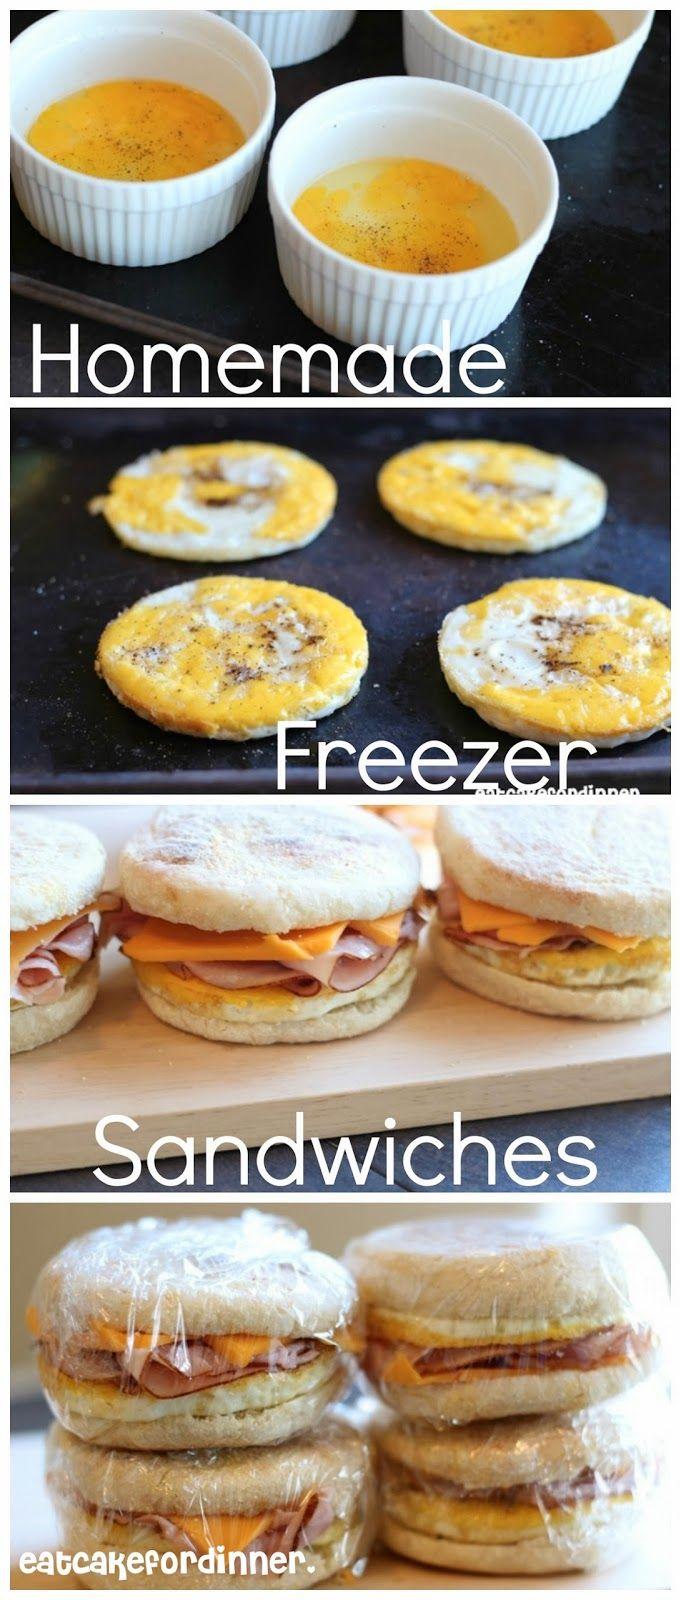 Definitely adding this to my meal prep agenda Eat Cake For Dinner: Homemade Freezer Breakfast Sandwiches